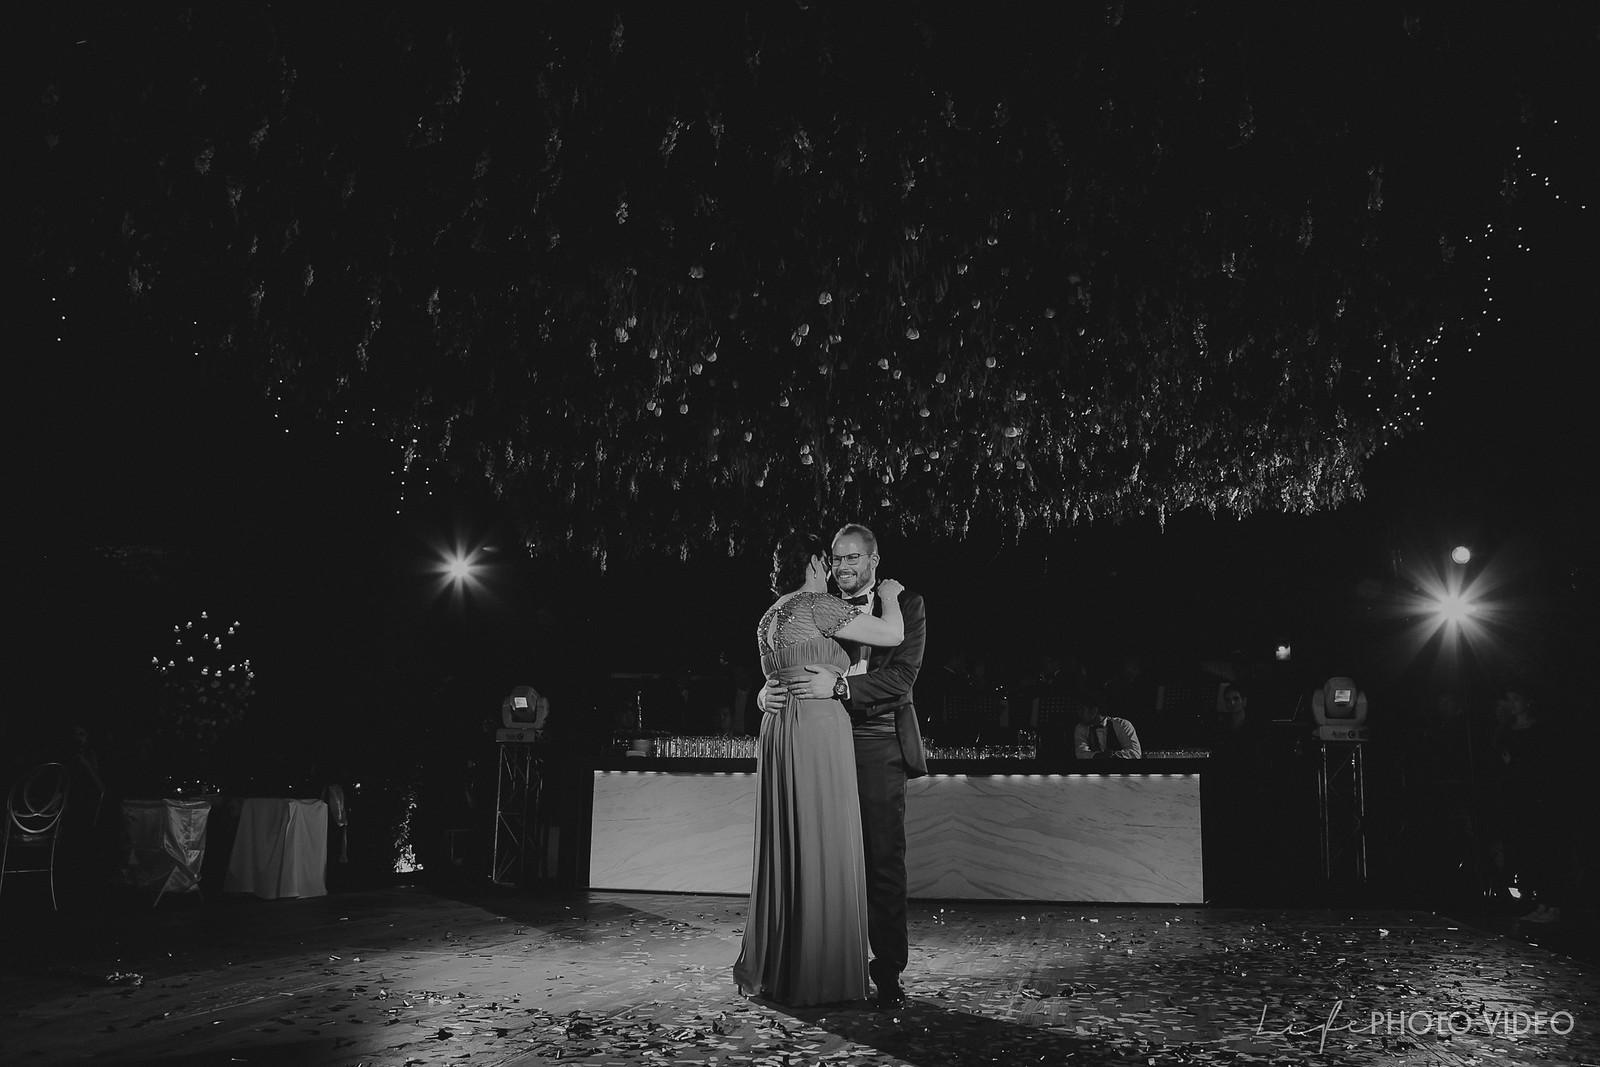 LifePhotoVideo_Boda_Guanajuato_Wedding_0063